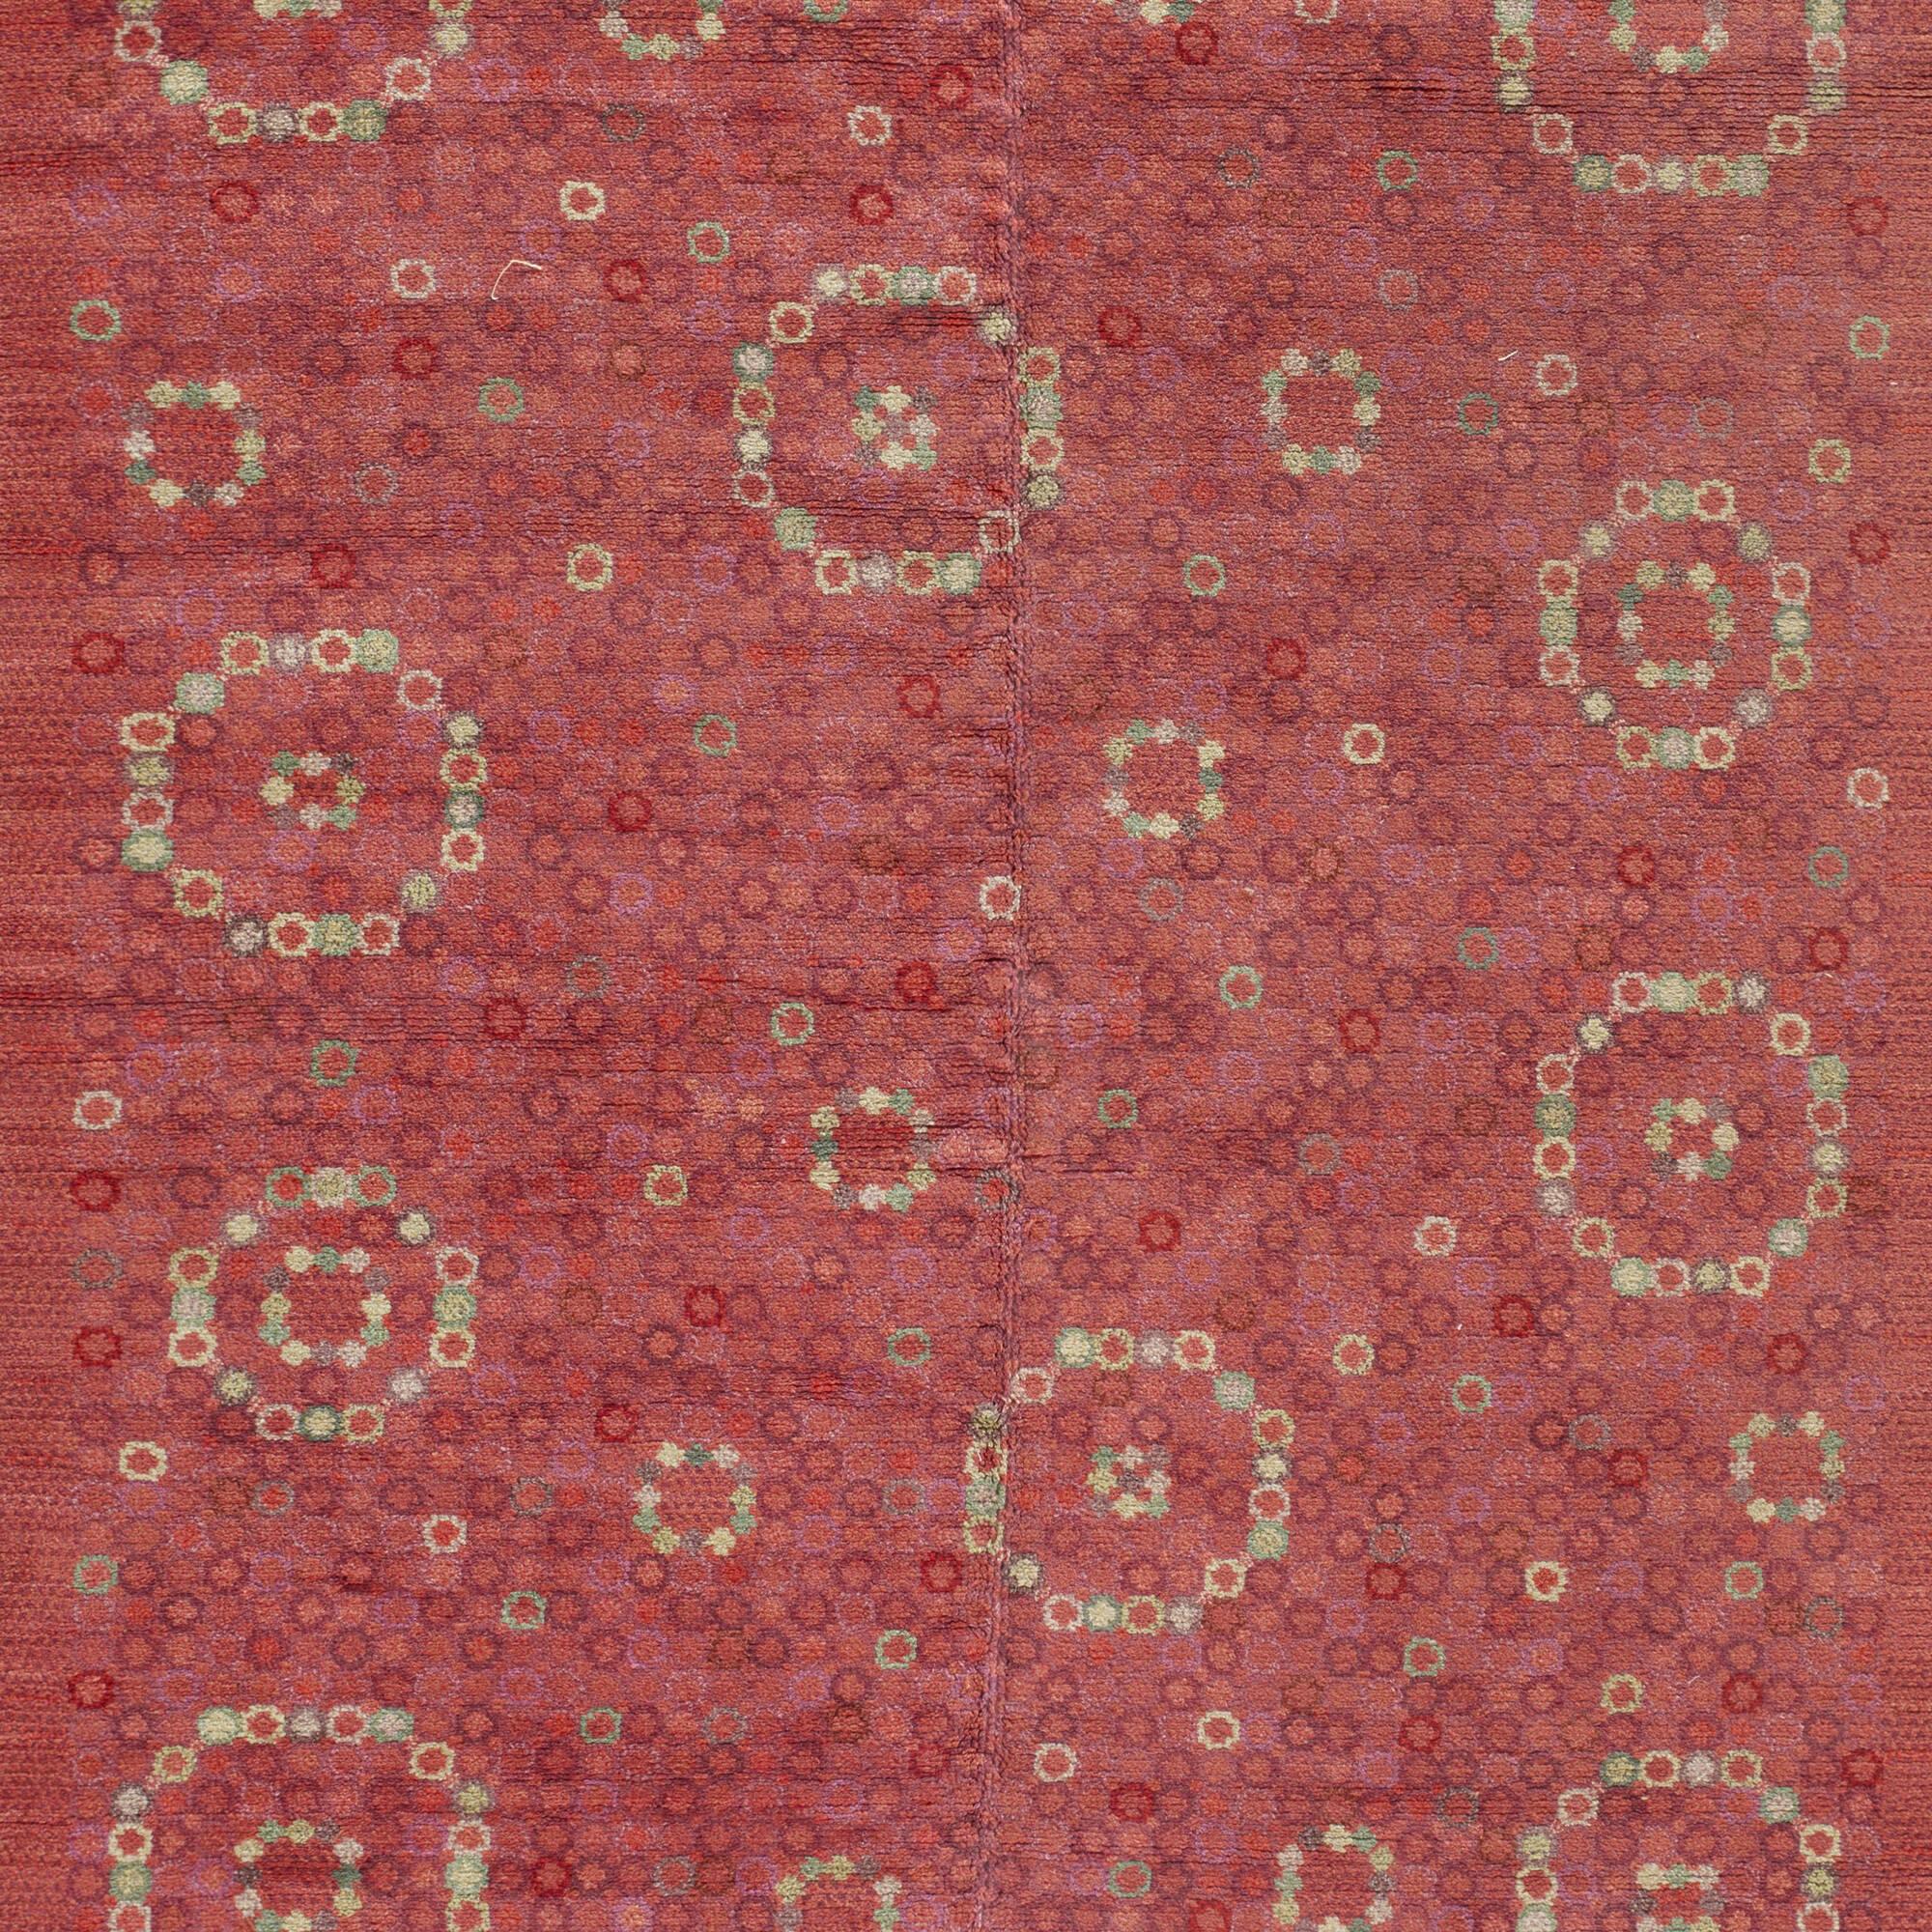 135: Barbro Nilsson / Bankrabbaten pile carpet (3 of 3)